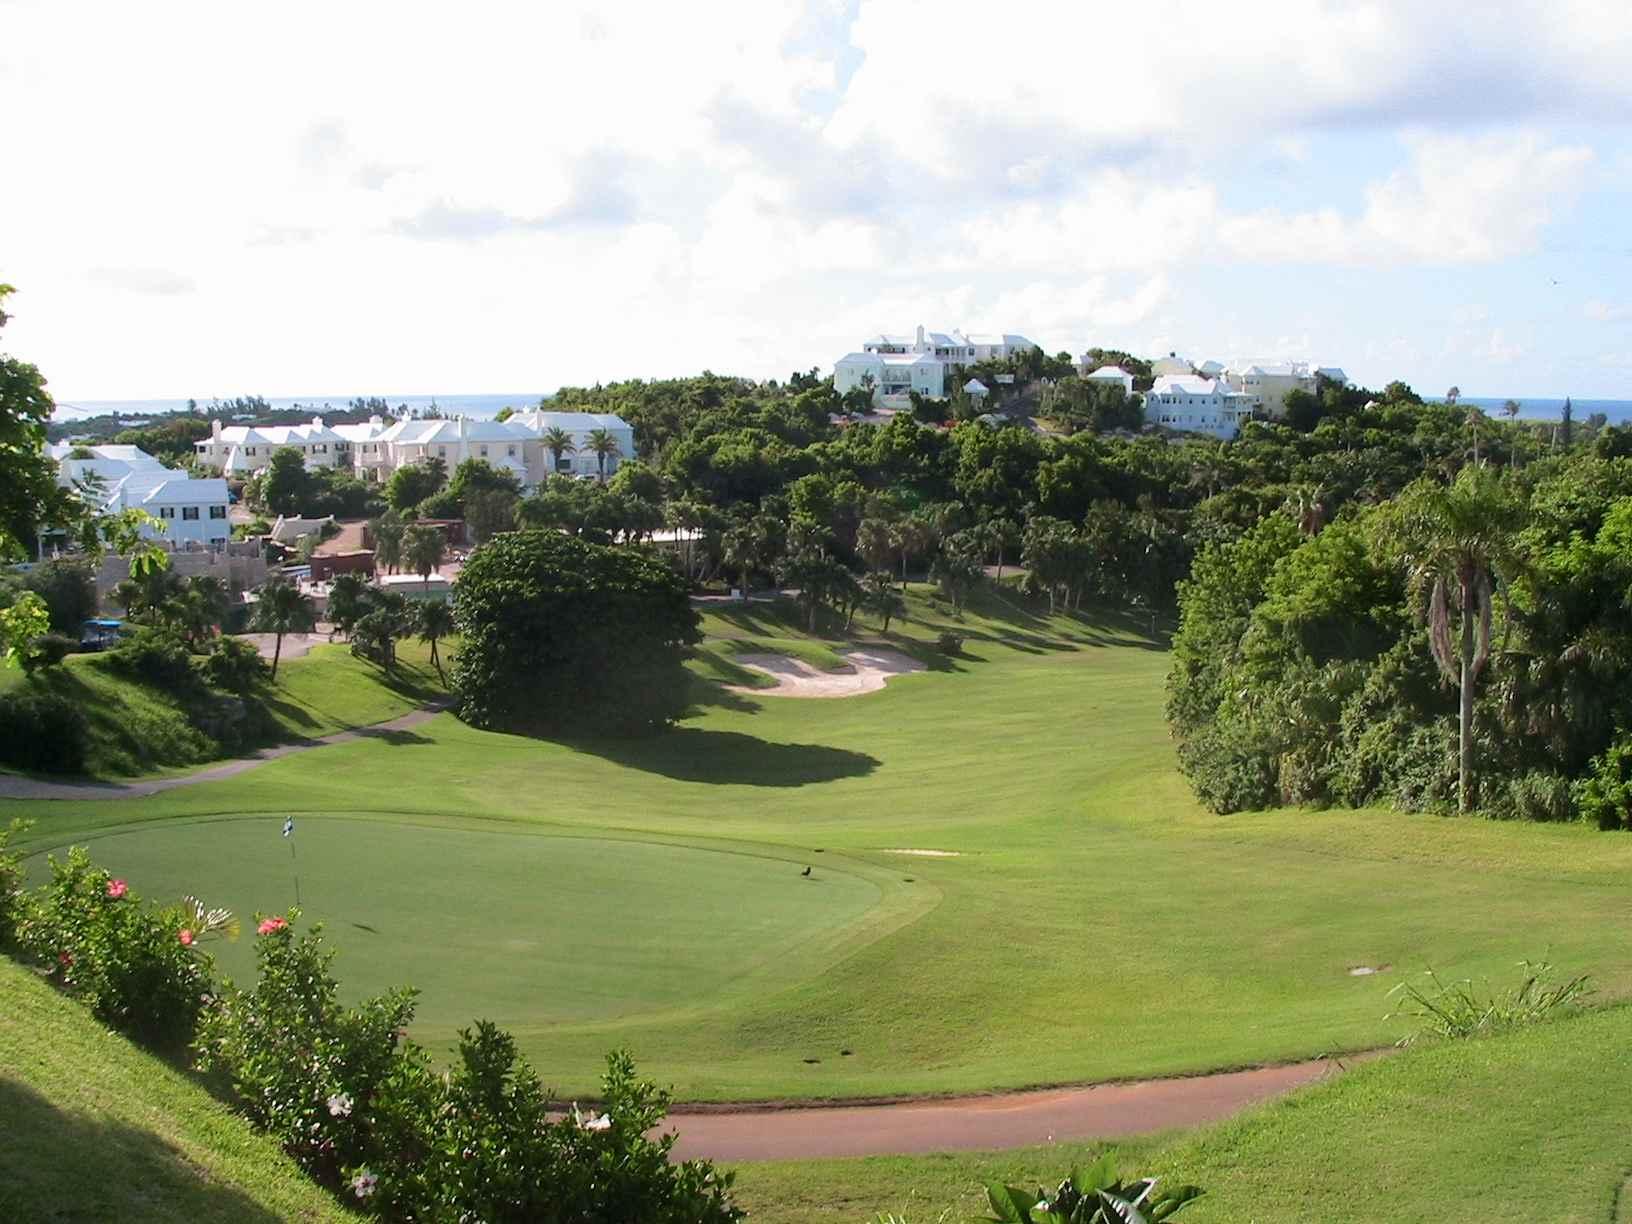 Golf course overlooking resort at Tucker's Point Club in Bermuda.